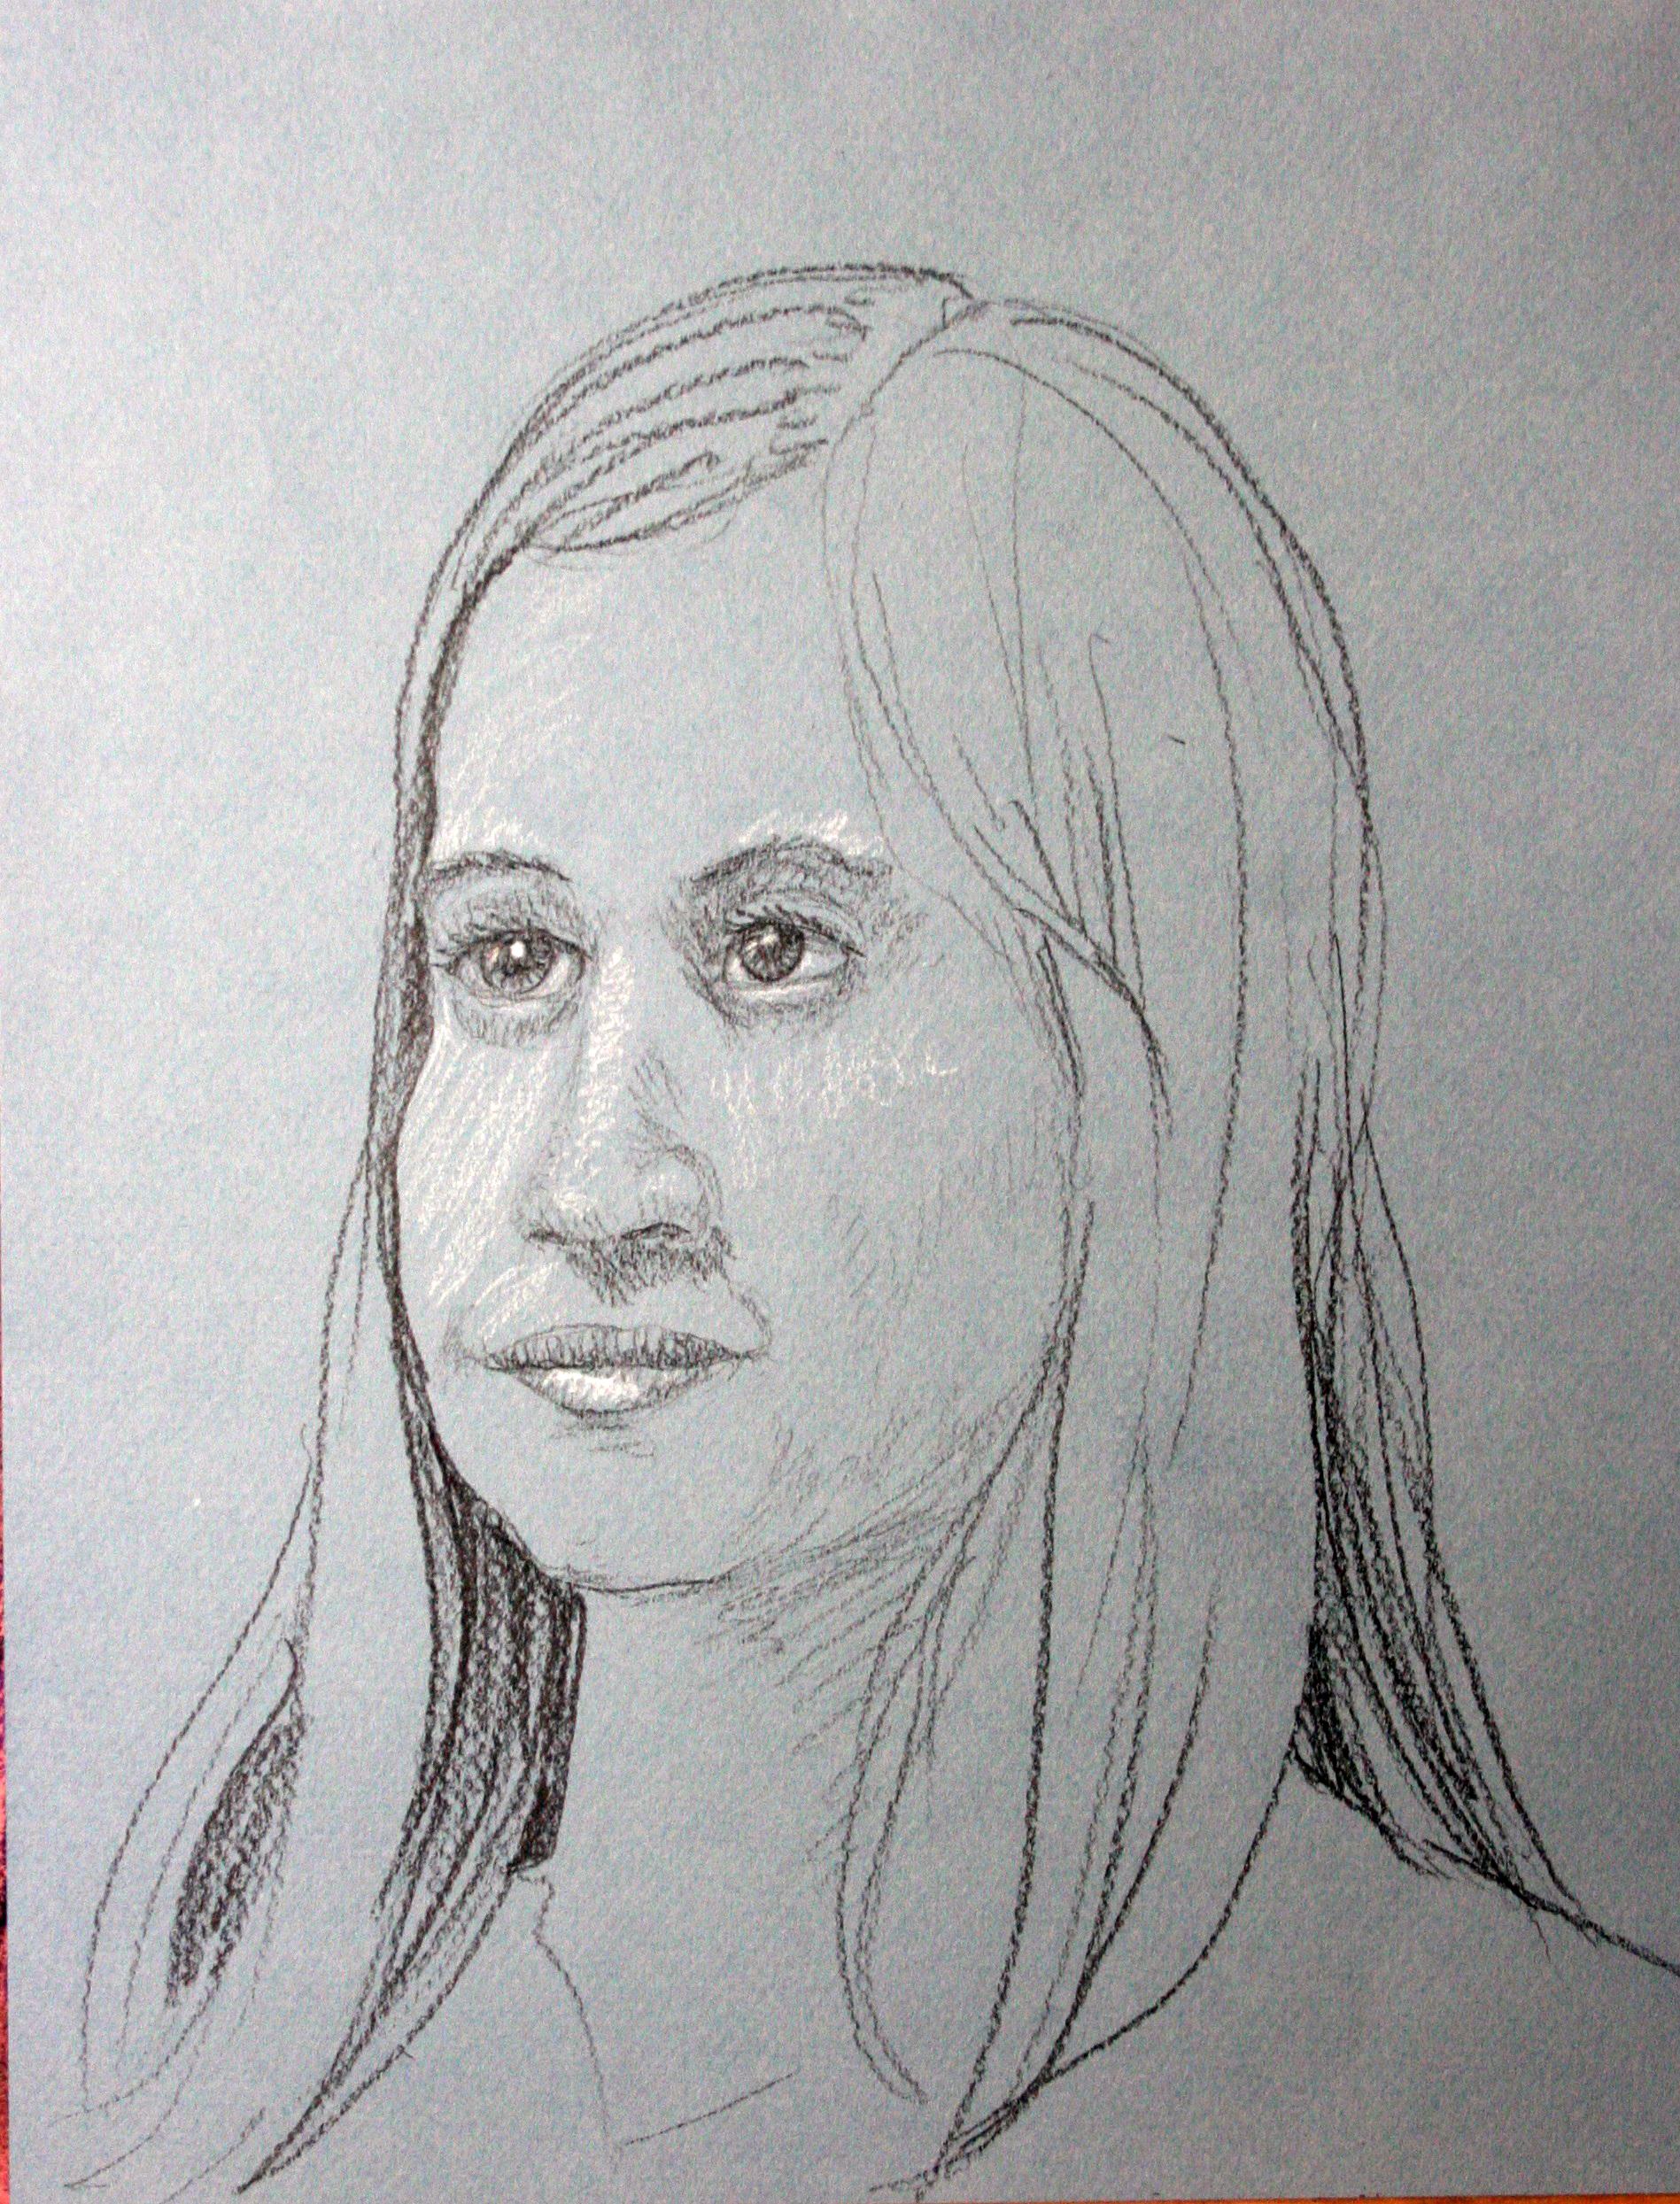 Kim Kristensen did this drawing.